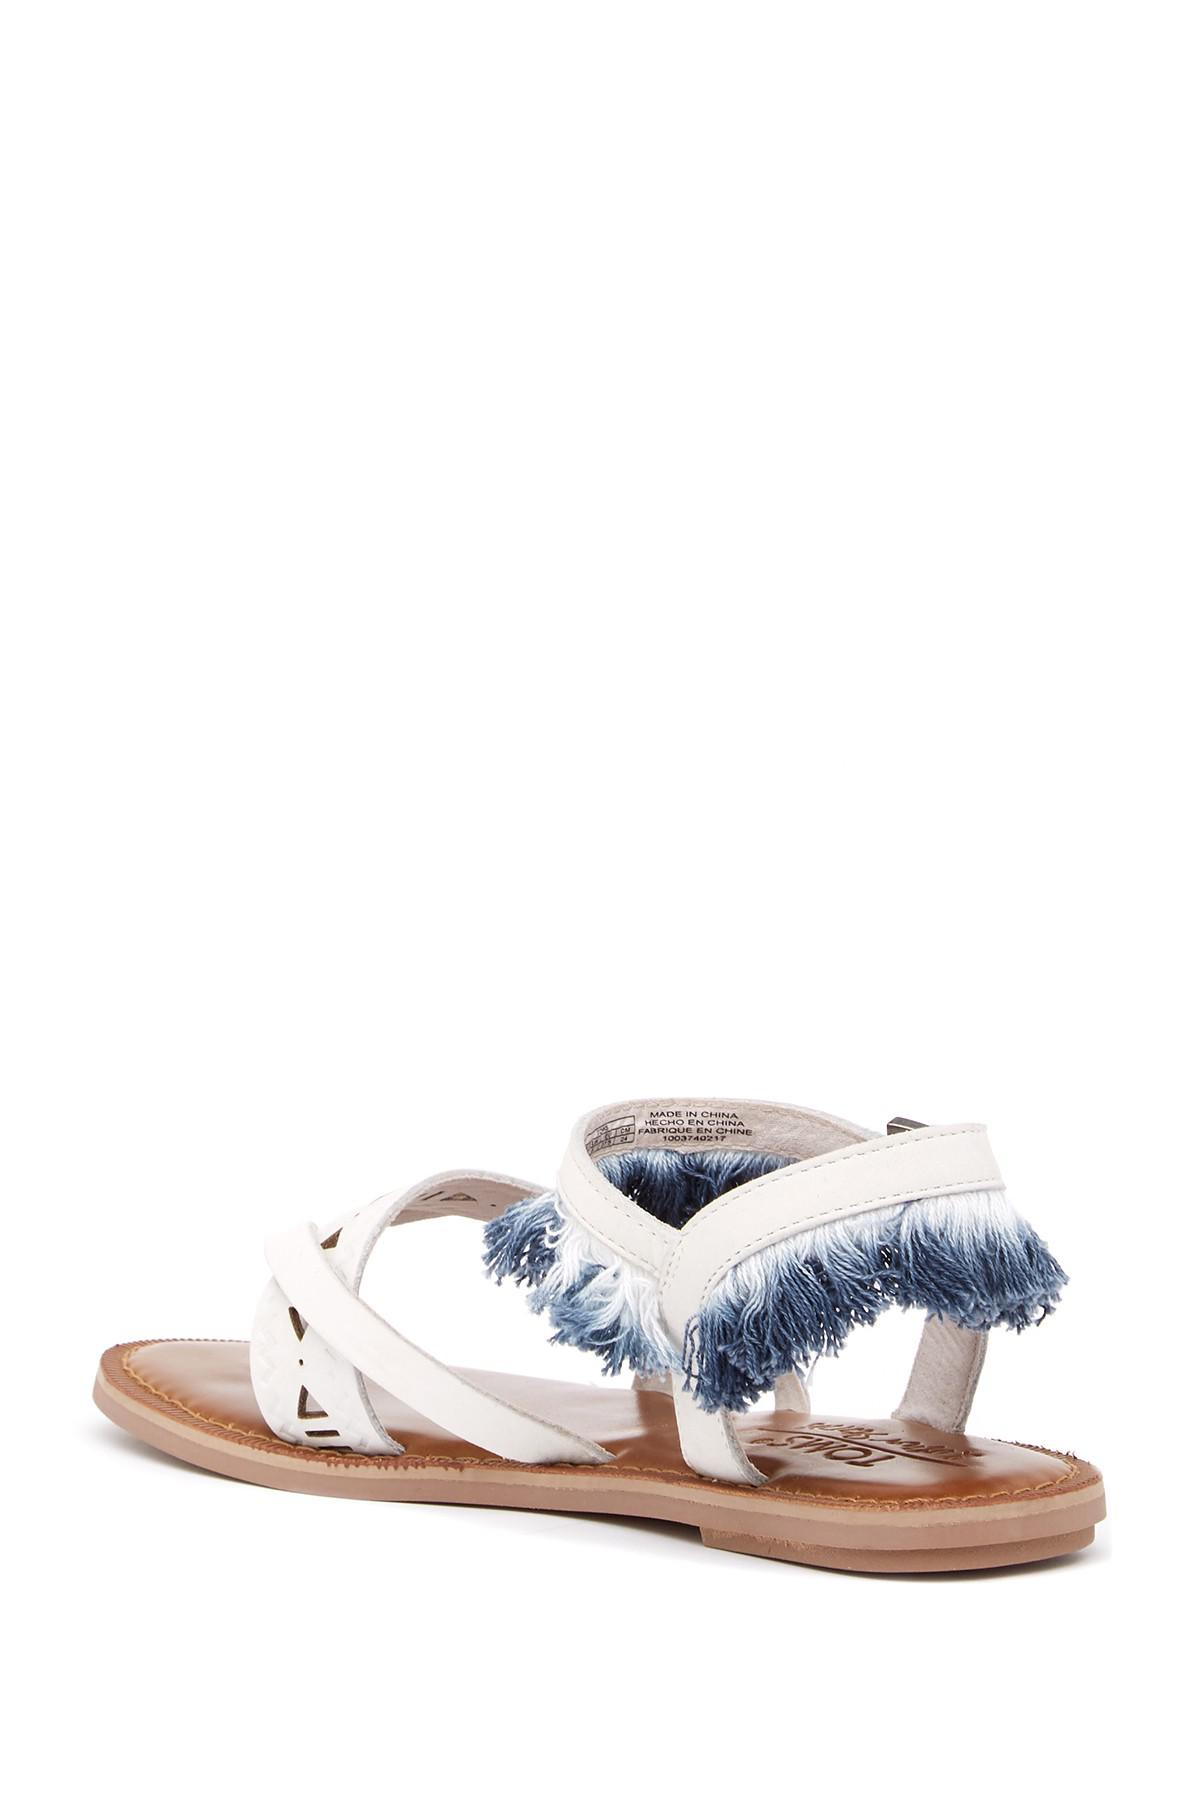 TOMS Lexie Fringe Leather Thong Sandal YZ2pLU1